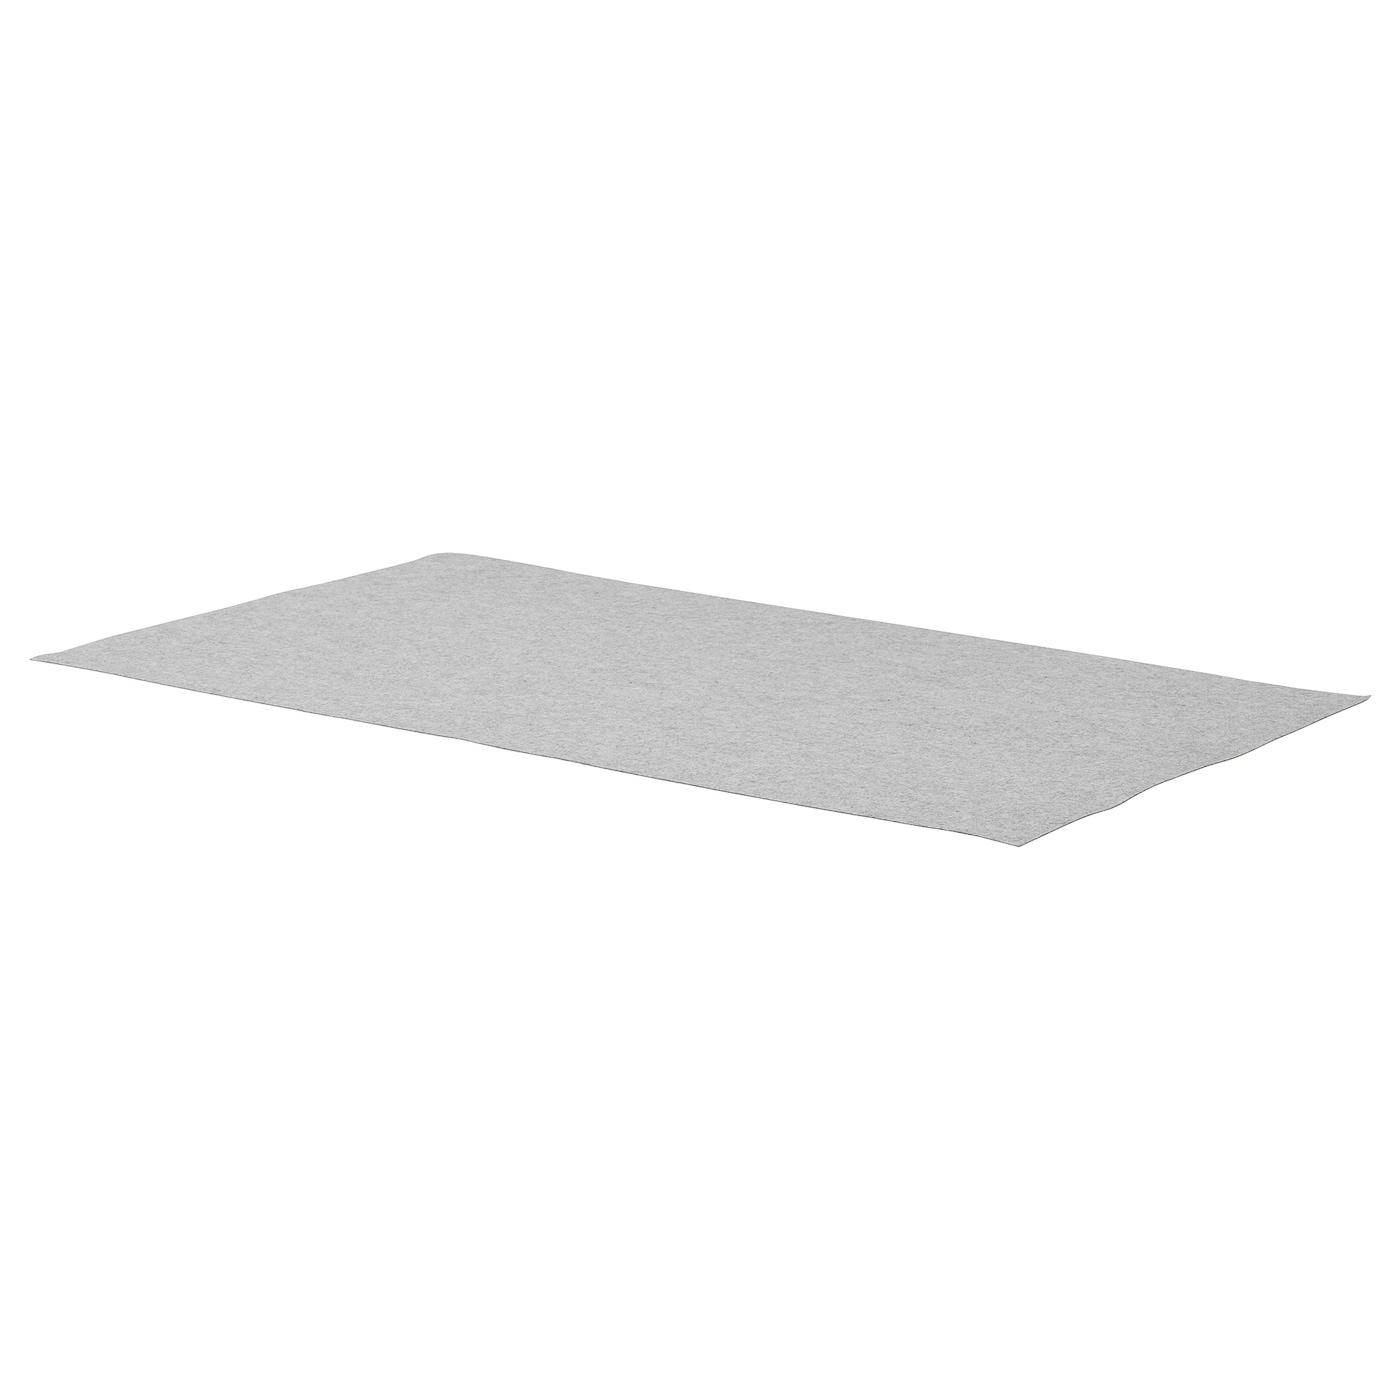 komplement tiroir blanc 50 x 58 cm ikea. Black Bedroom Furniture Sets. Home Design Ideas